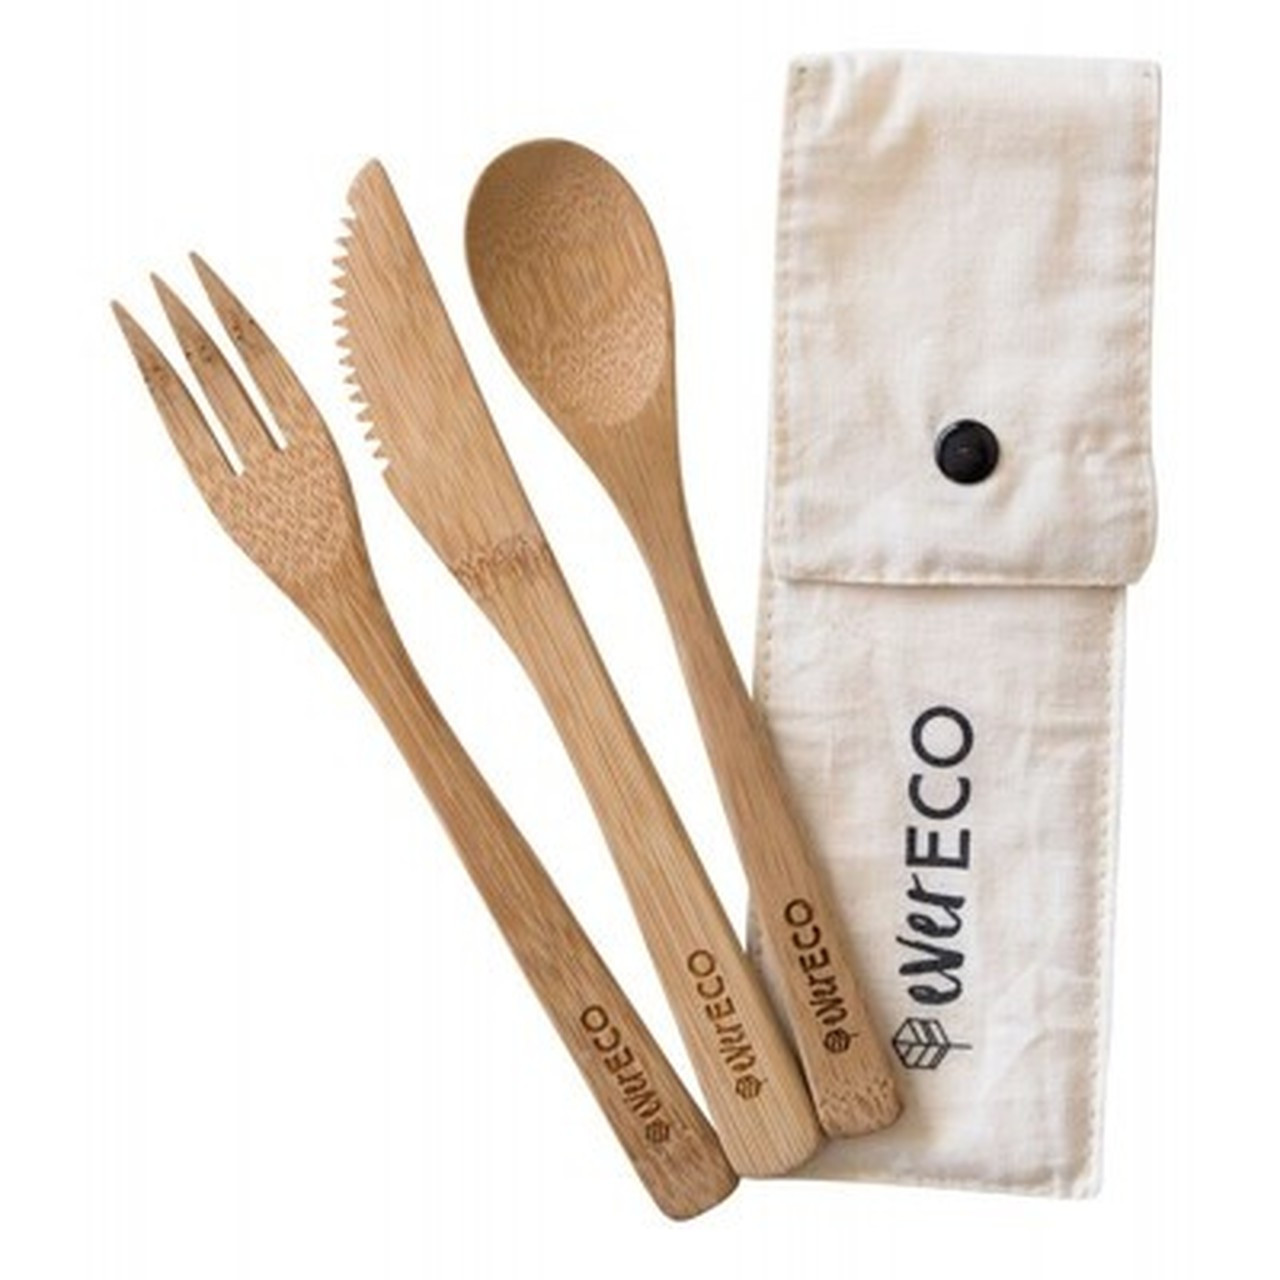 ECO Bamboo Cutlery Set